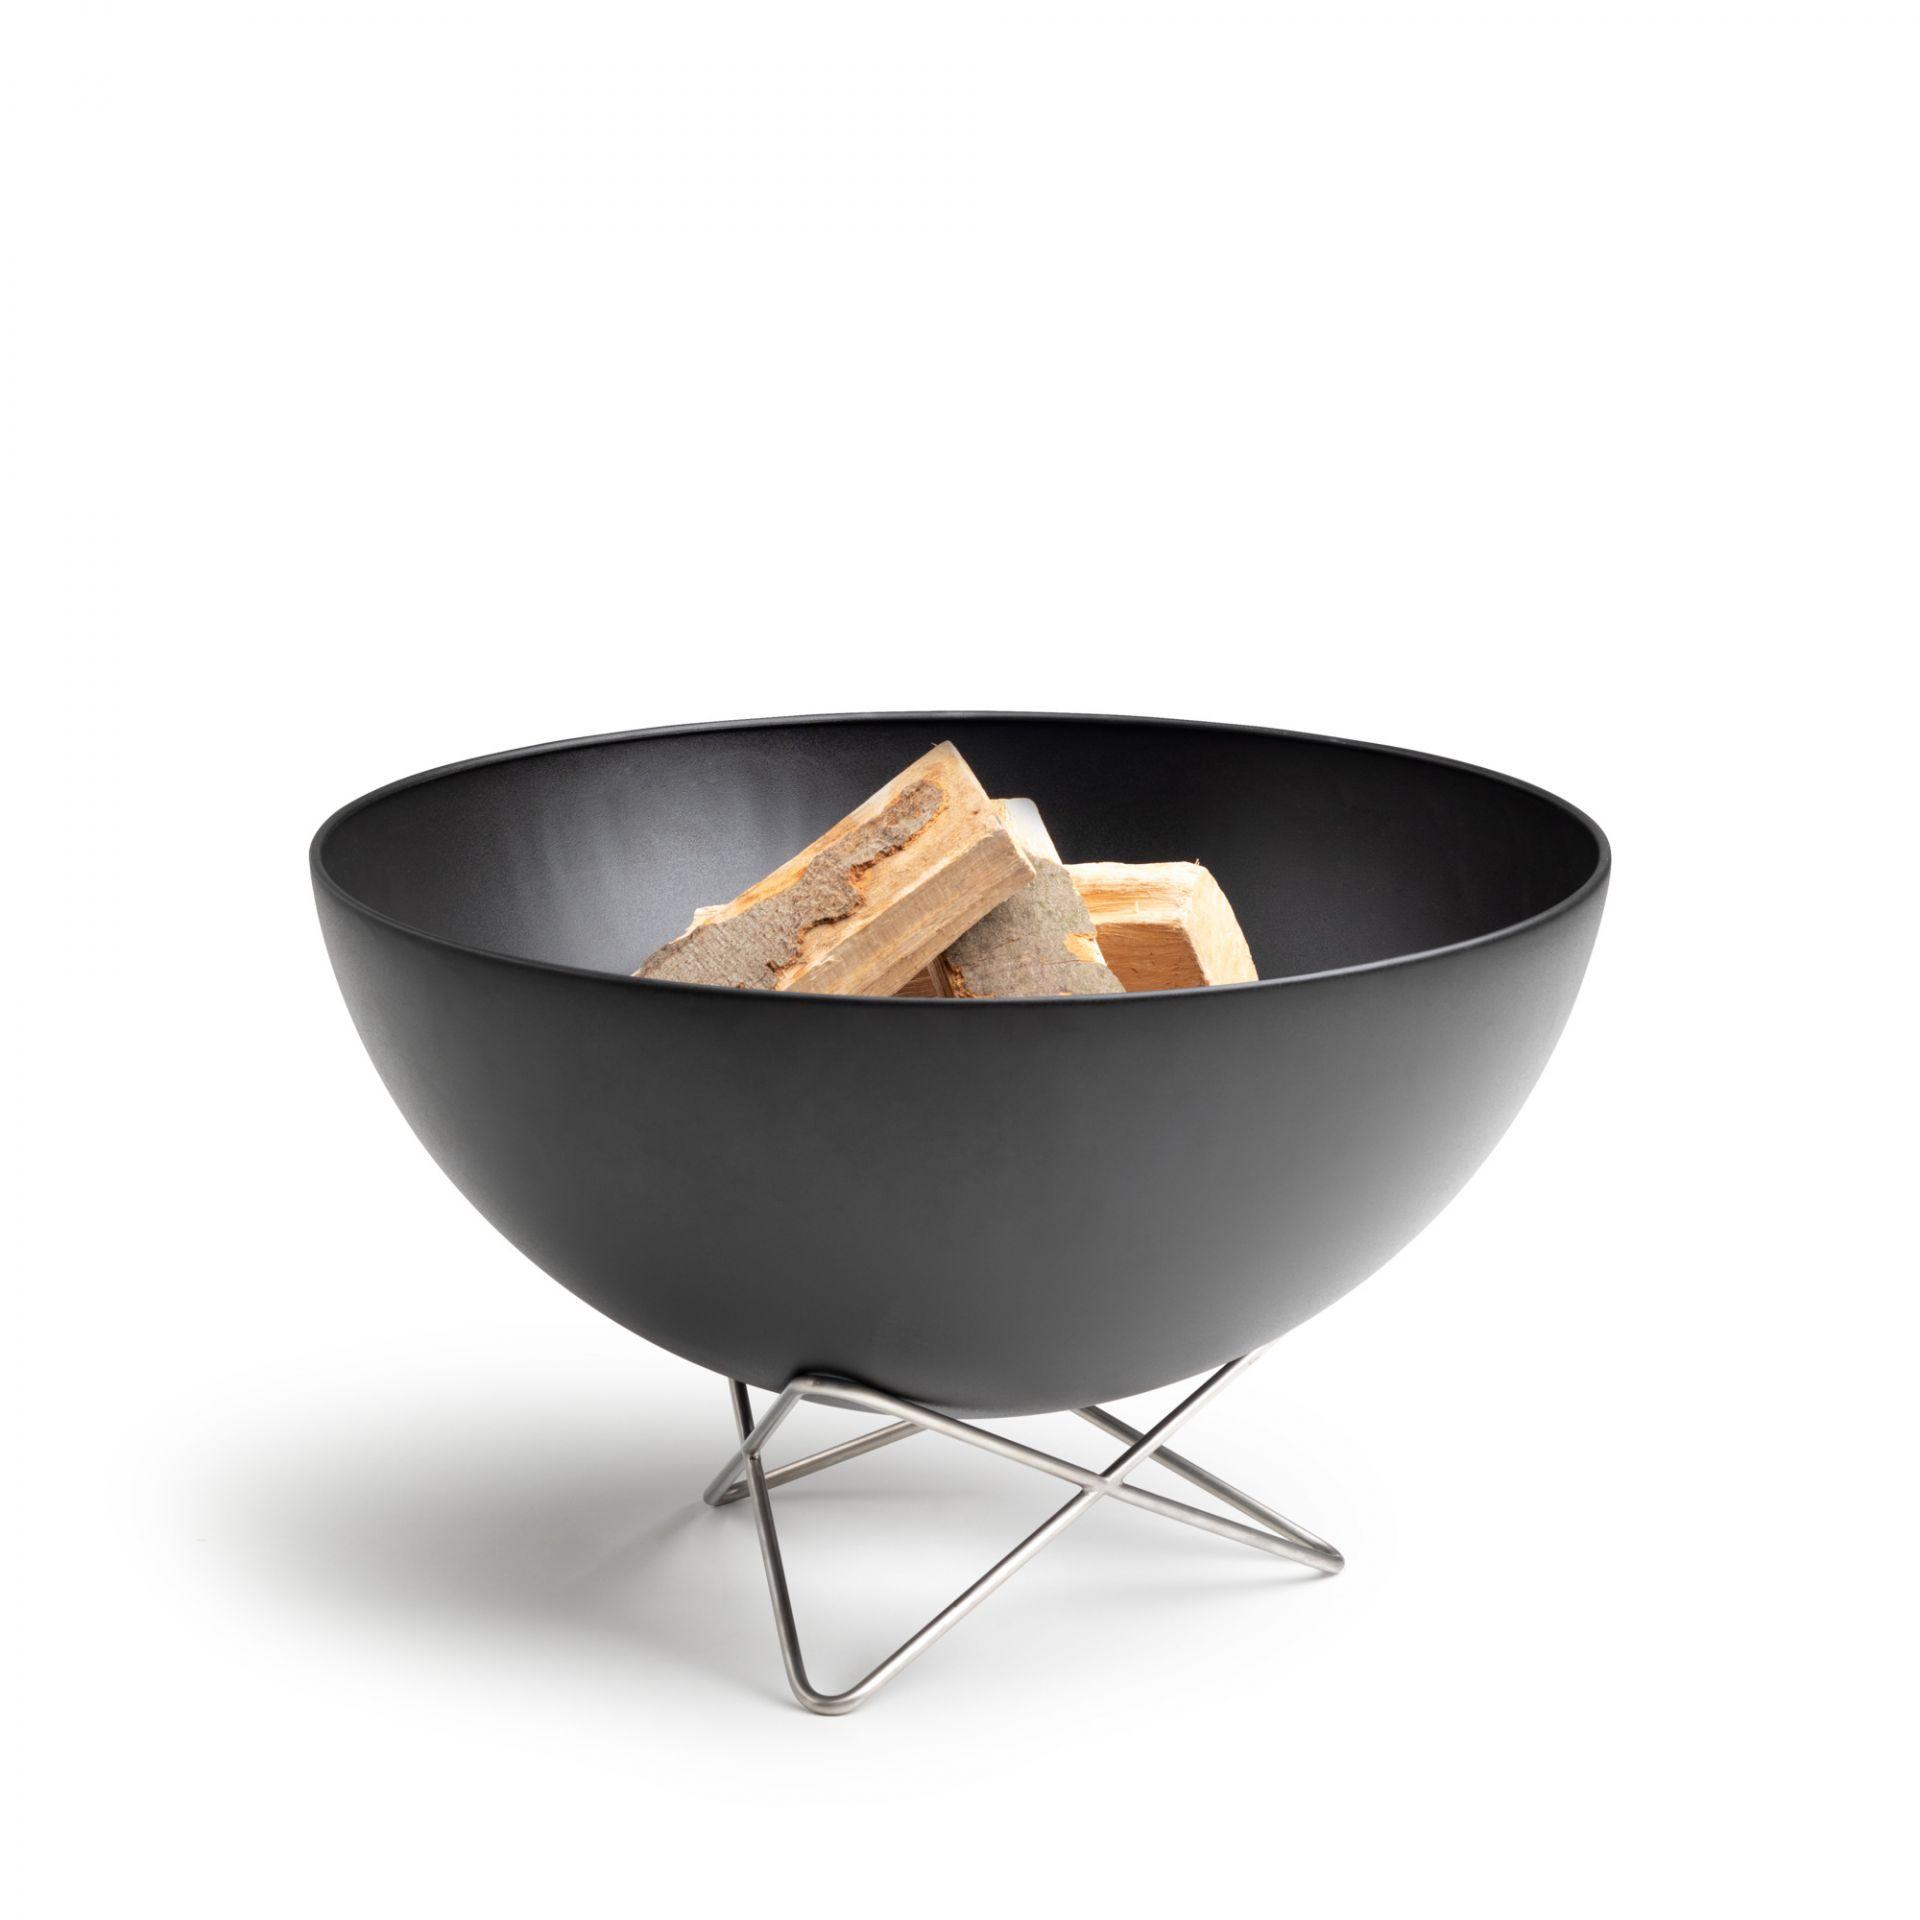 Bowl Feuerschale mit Drahtfuß höfats